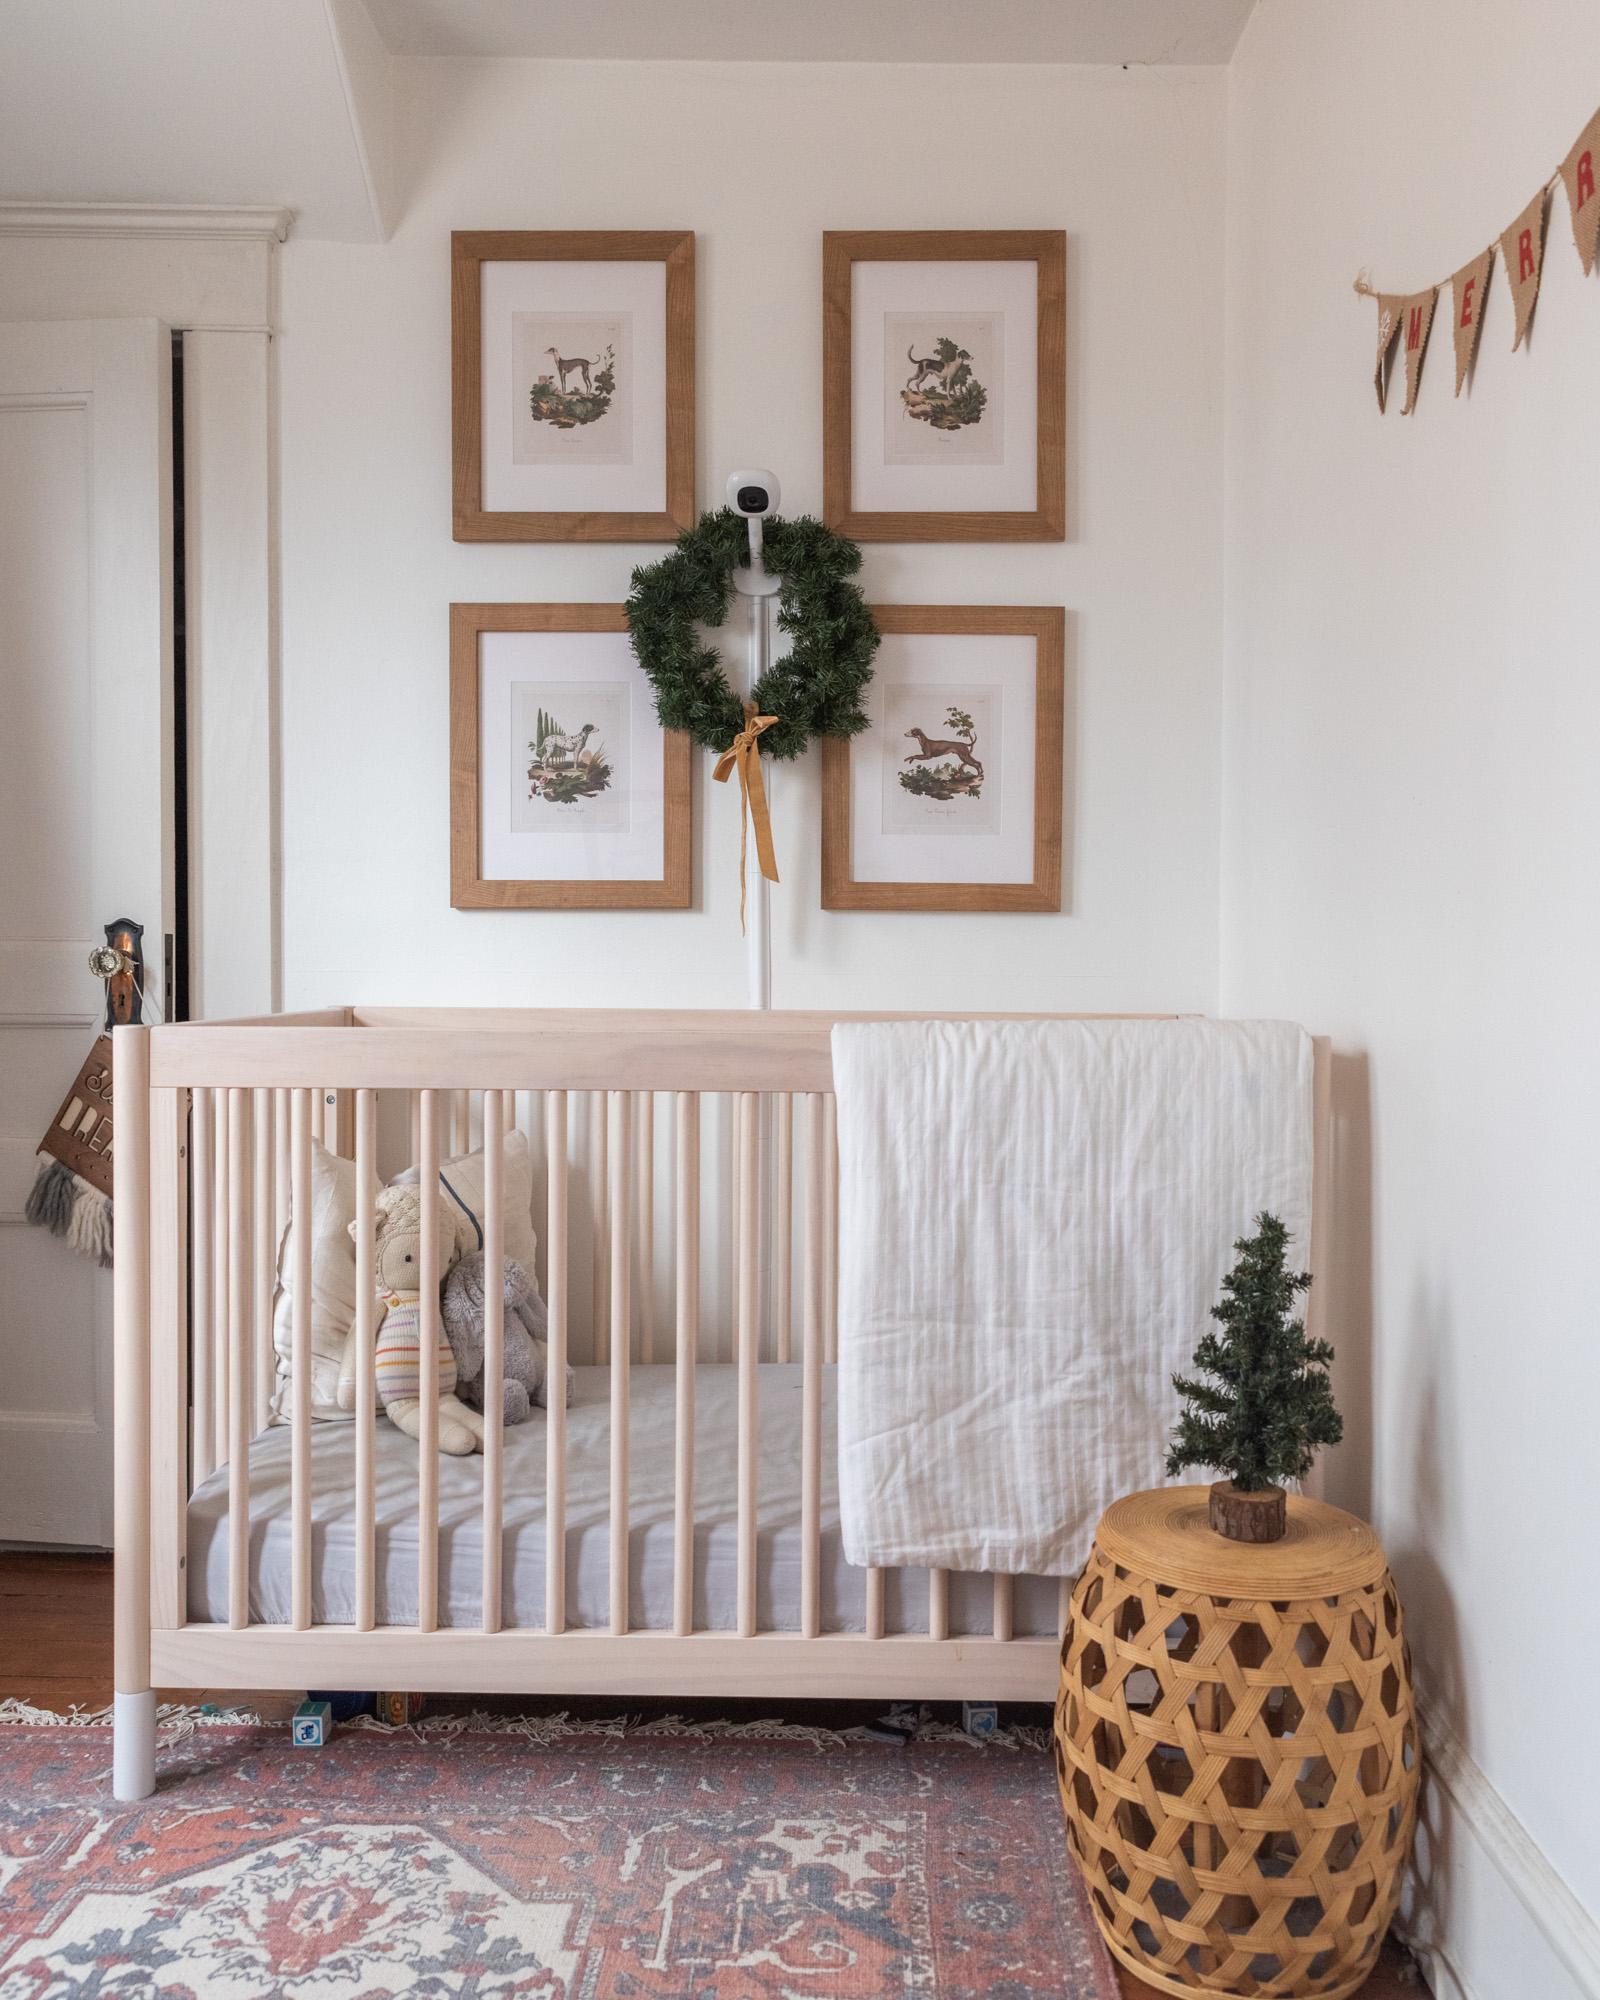 The Wild decoelis | 2020 Holiday Home Tour | Nursery with Christmas decorations, dog vintage prints, cuddle and kind teddy bear, vintage wool rug